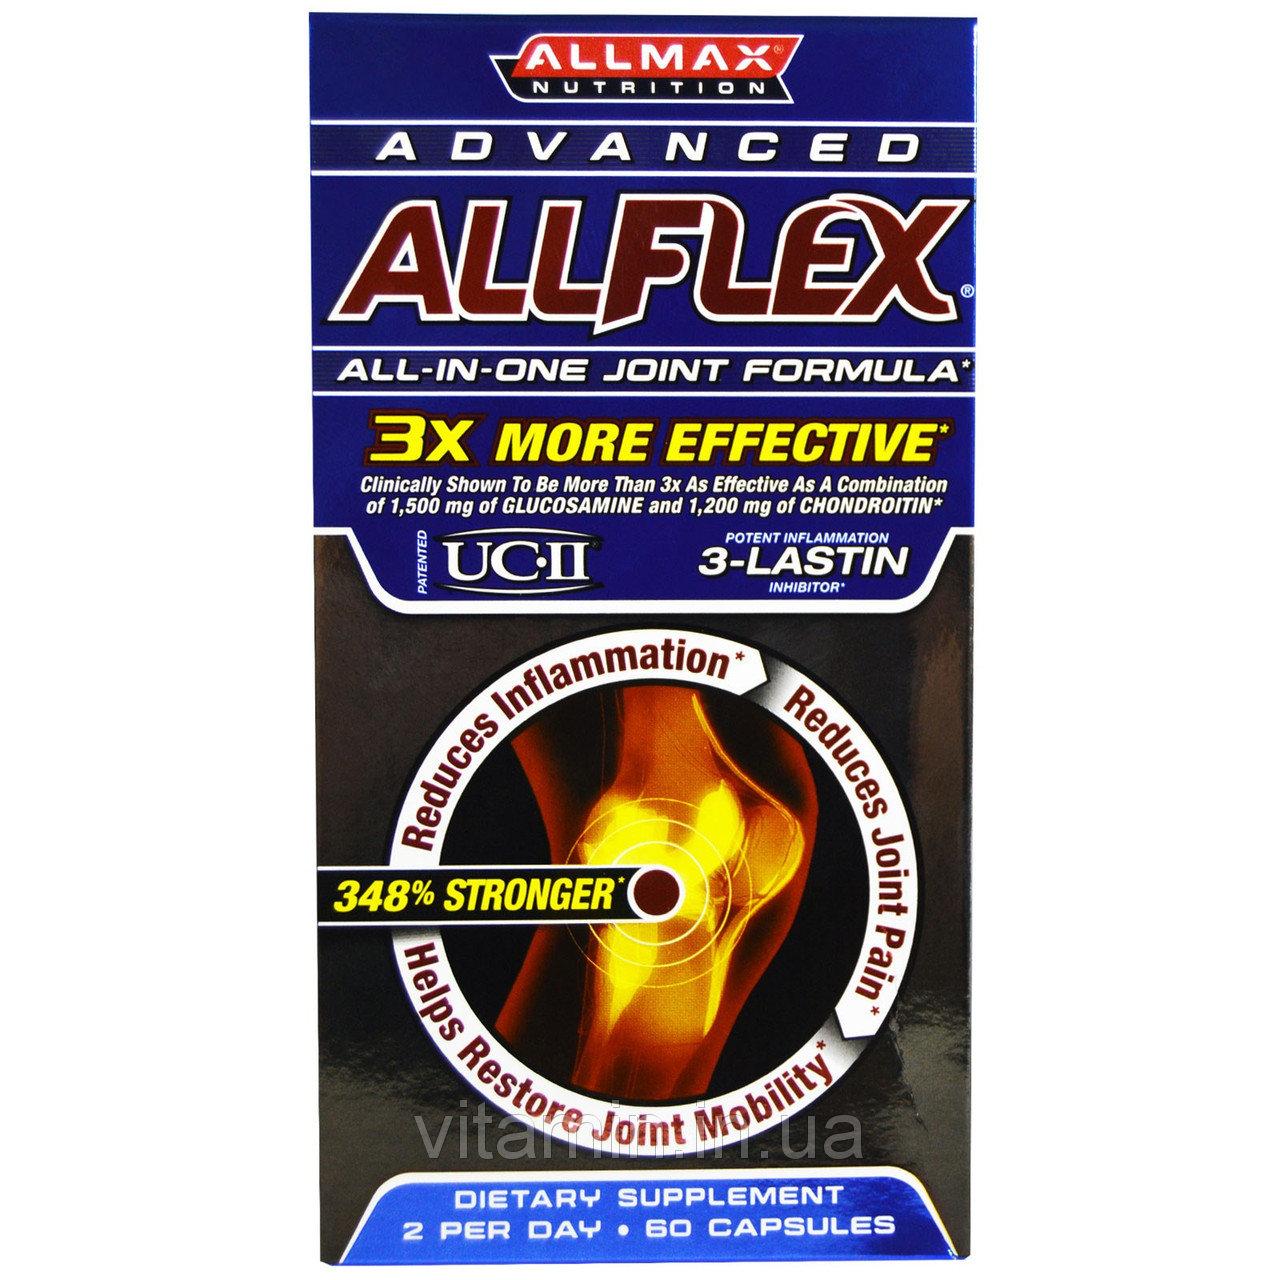 Витамины для суставов - ALLMAX Nutrition, Advanced AllFlex, All-In-One Joint Formula, 60 Capsules